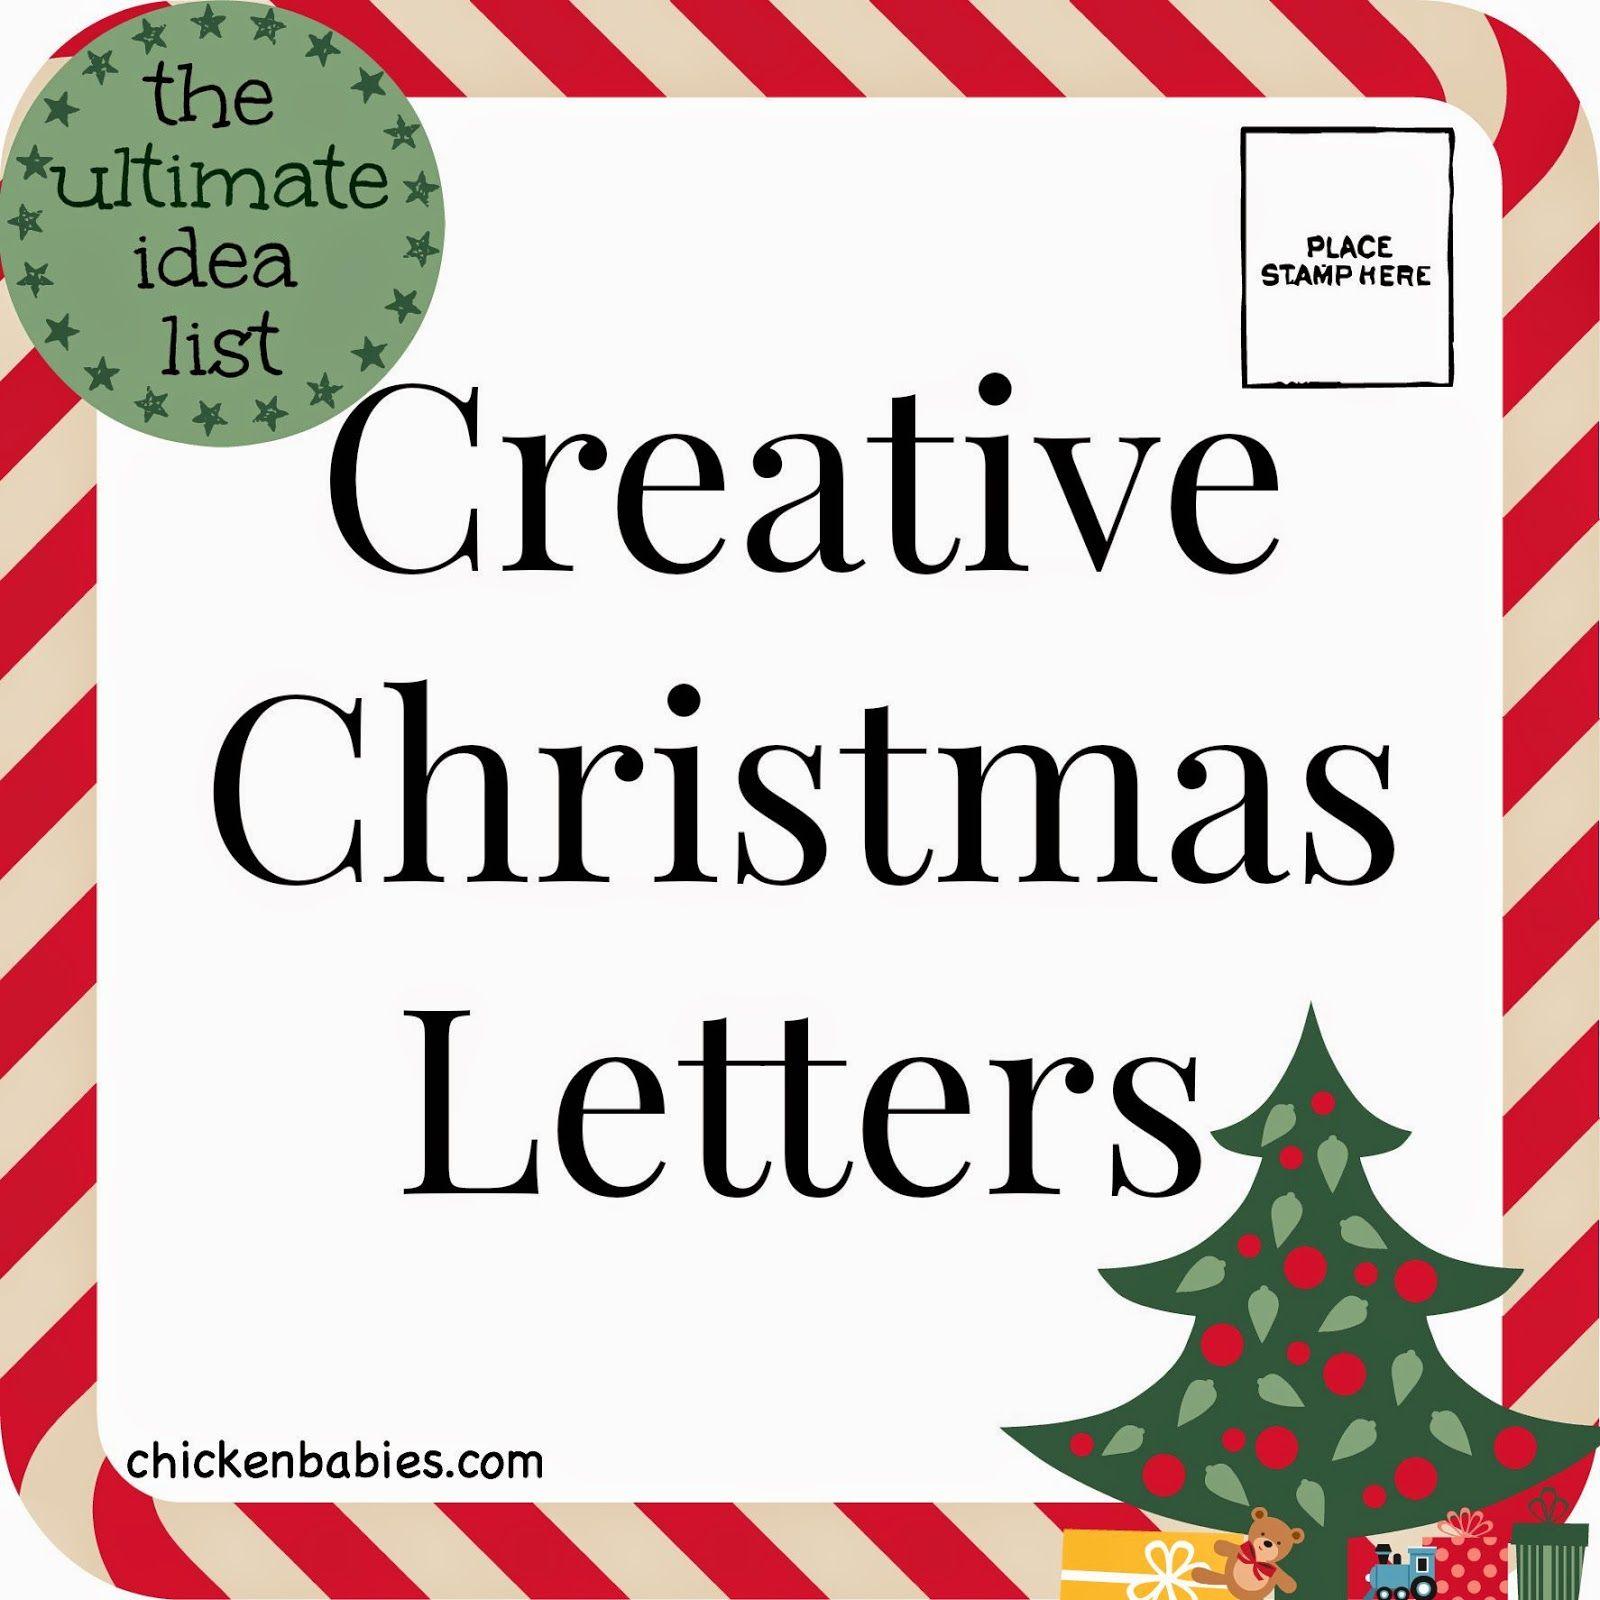 Creative Christmas Letters Creative Christmas Cards Christmas Lettering Holiday Lettering